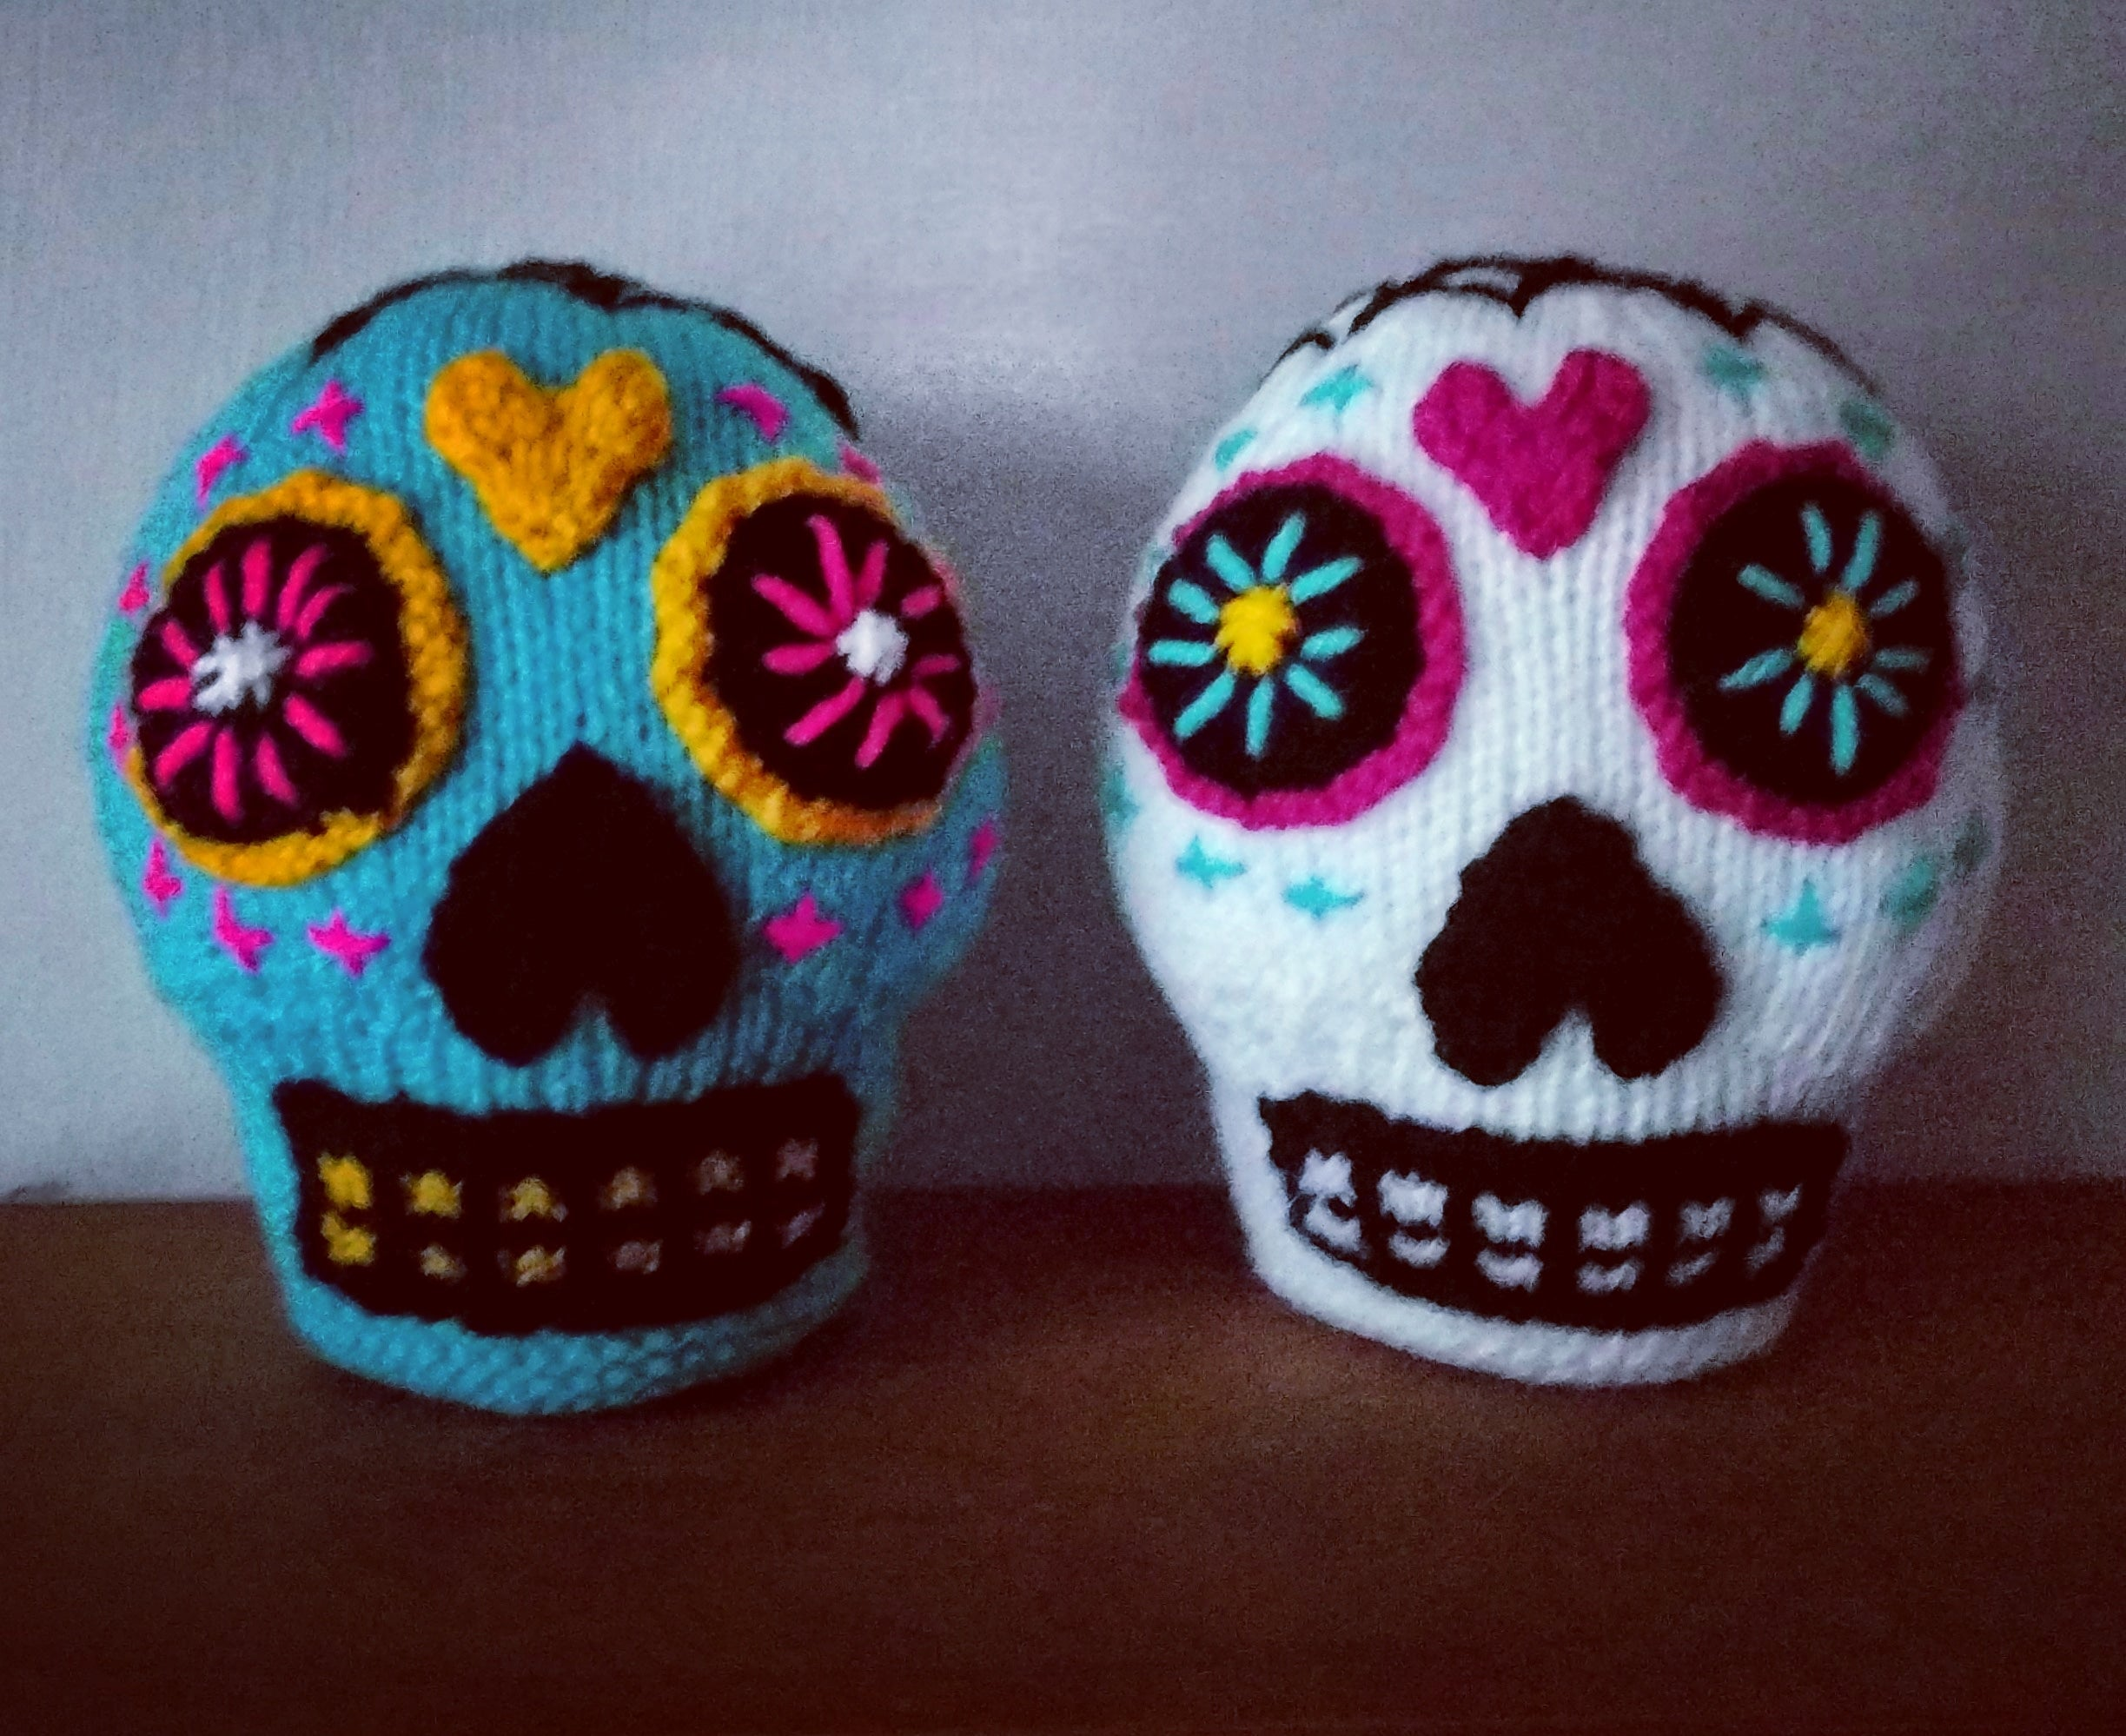 47syaj4djtr51 - I love Sugar Skulls! I am going to make a few more in different colors too :) - hobbies, crafts